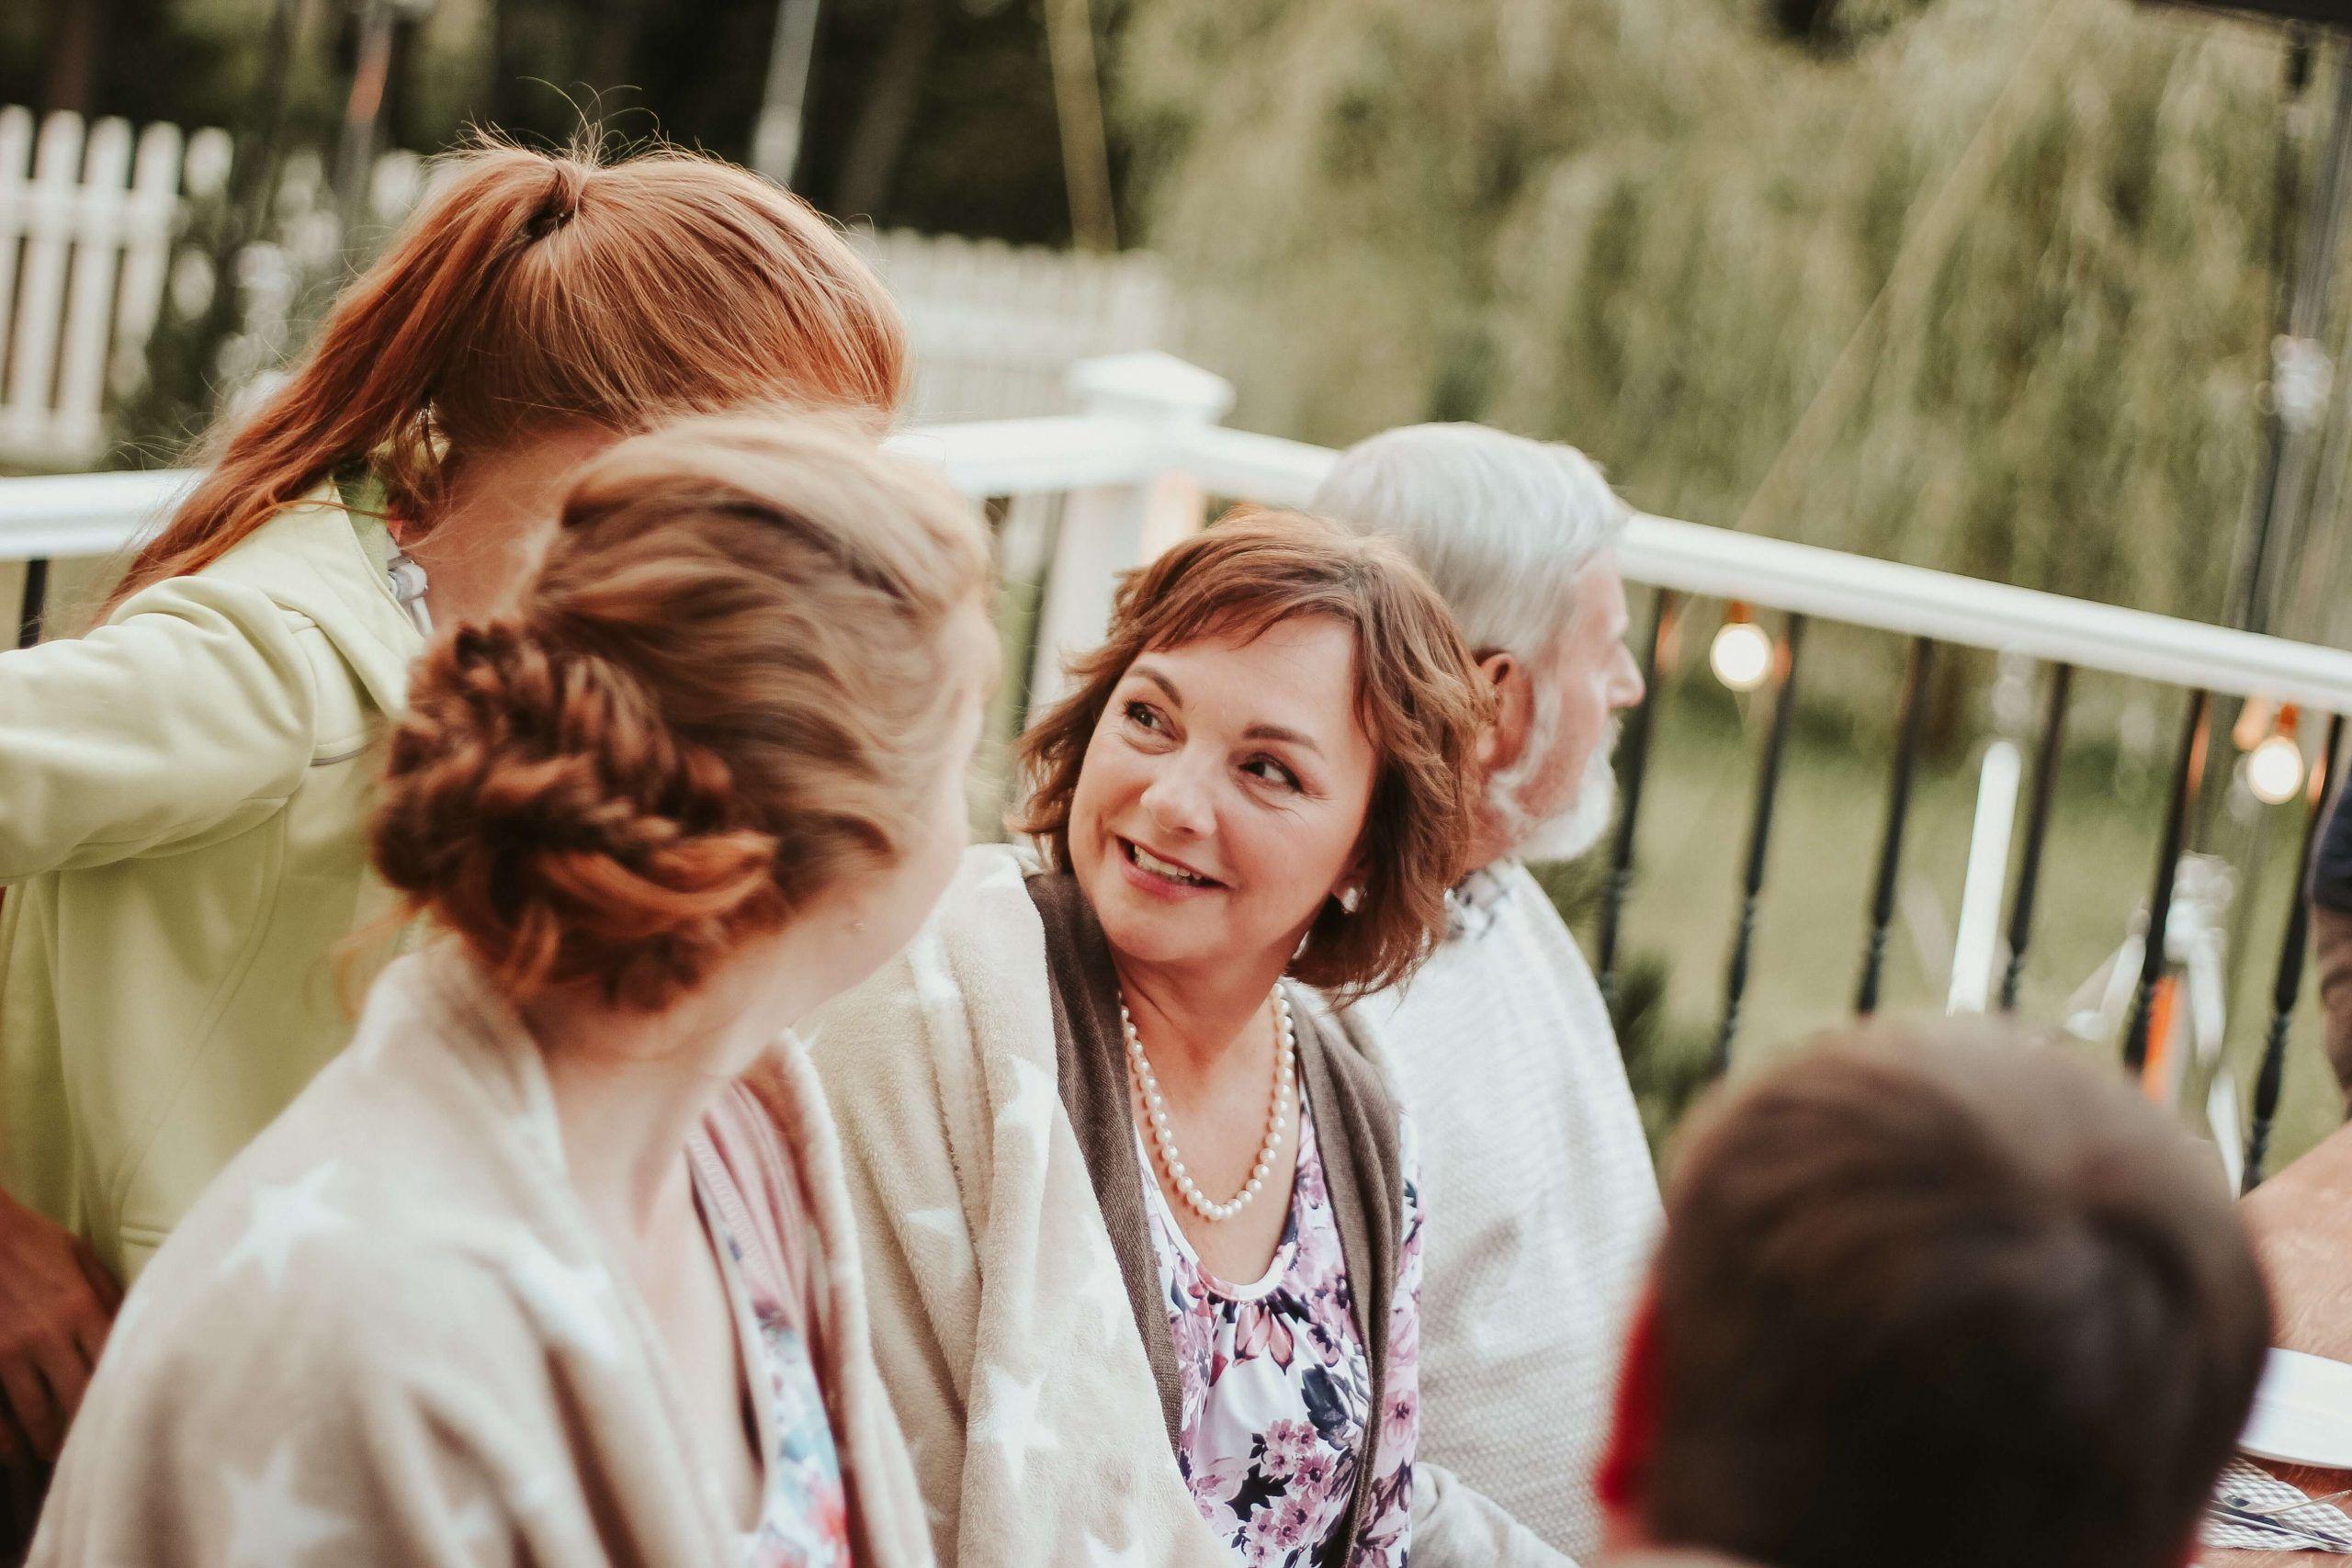 herencia sin aceptar todavia reunion de familiares